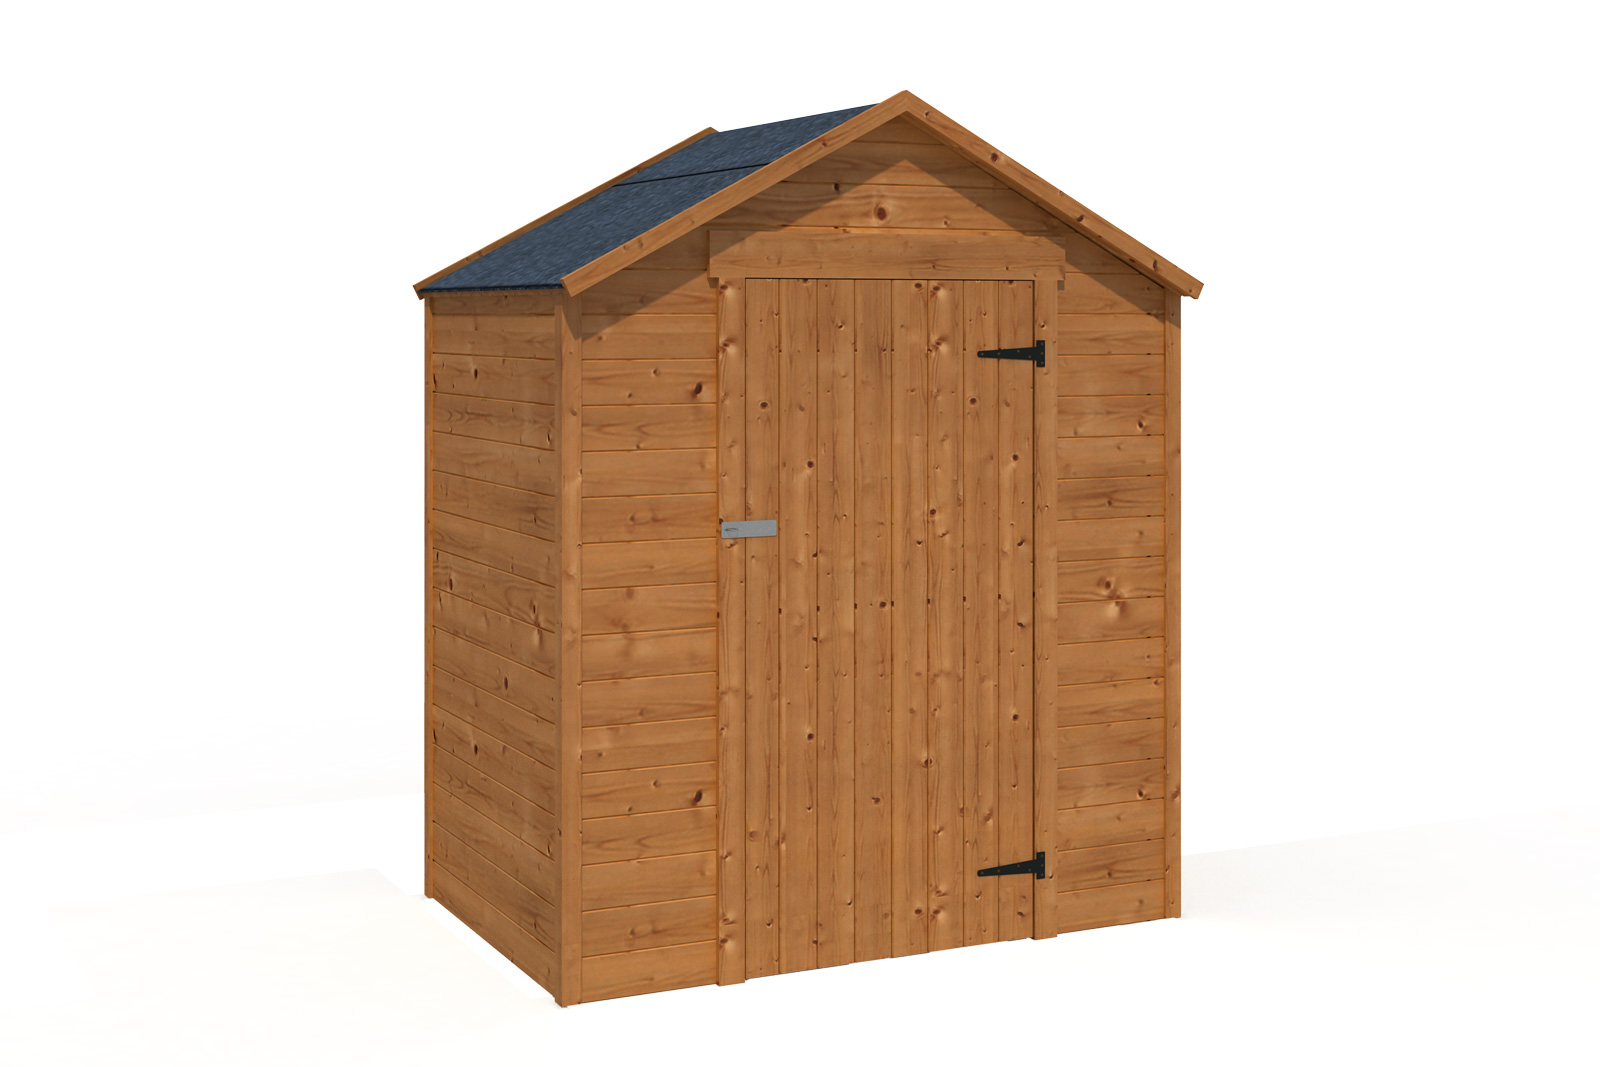 Abri Bois2x1 Terrasse Mobil Home Deckit Fabricant terrasses en bois pour mobilhomes  # Fabricant Mobil Home Bois